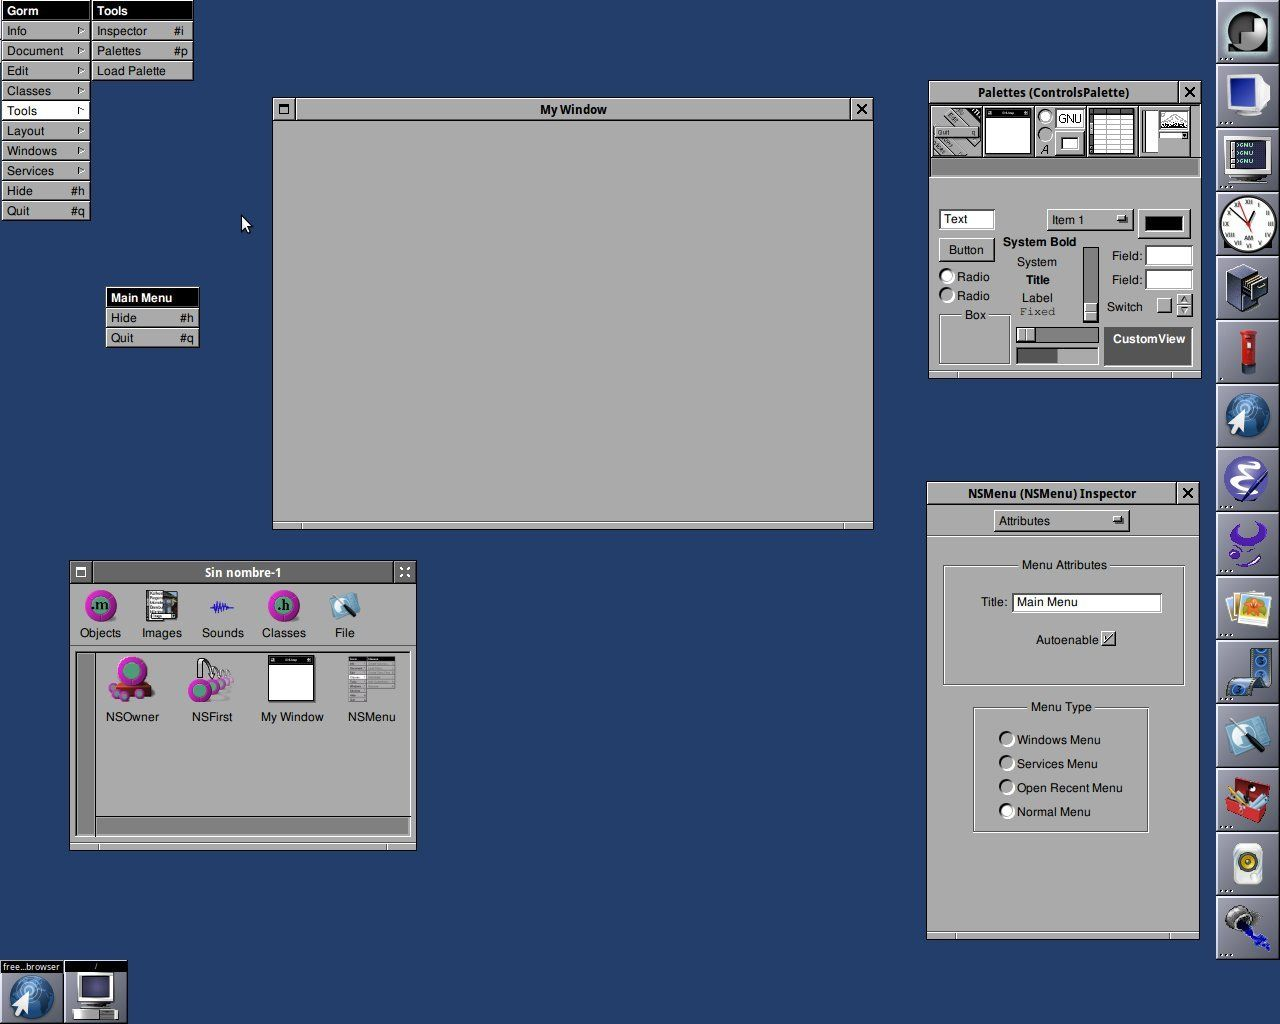 gnustep-nextstep-desktop-window-maker